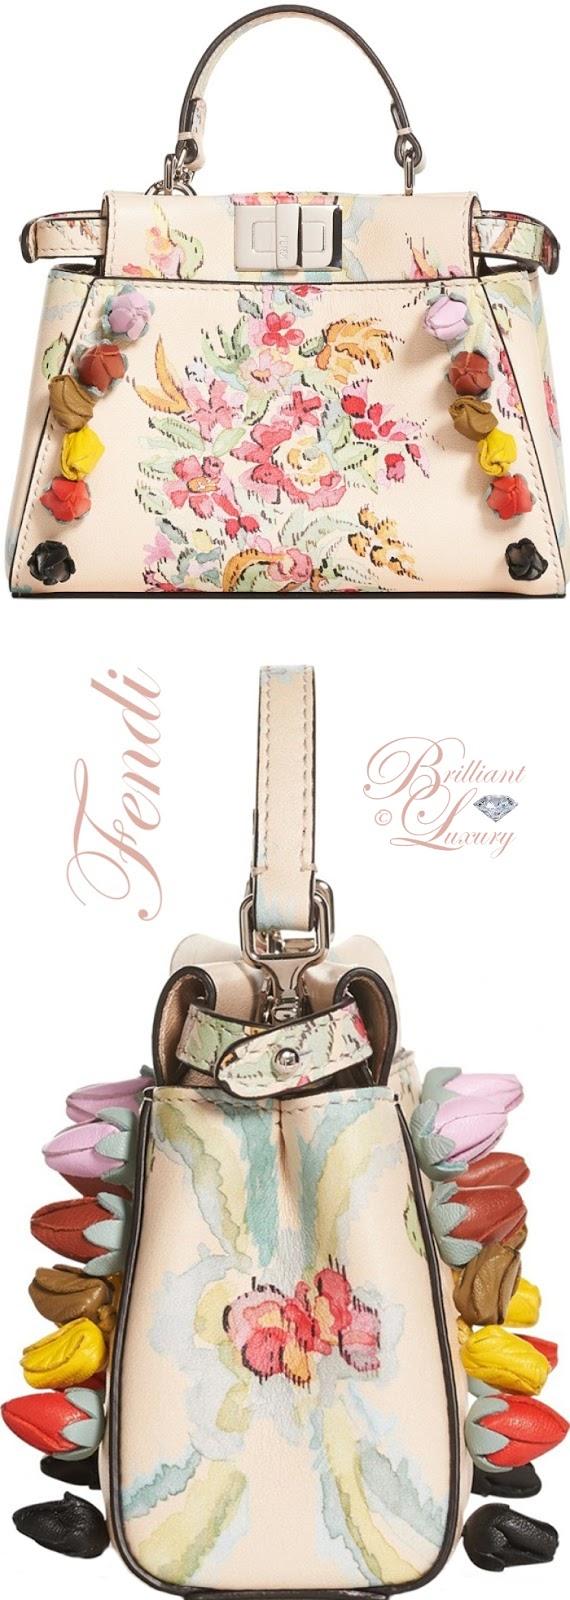 Brilliant Luxury  ♦Fendi Micro Peekaboo Floral Appliqué Leather Satchel